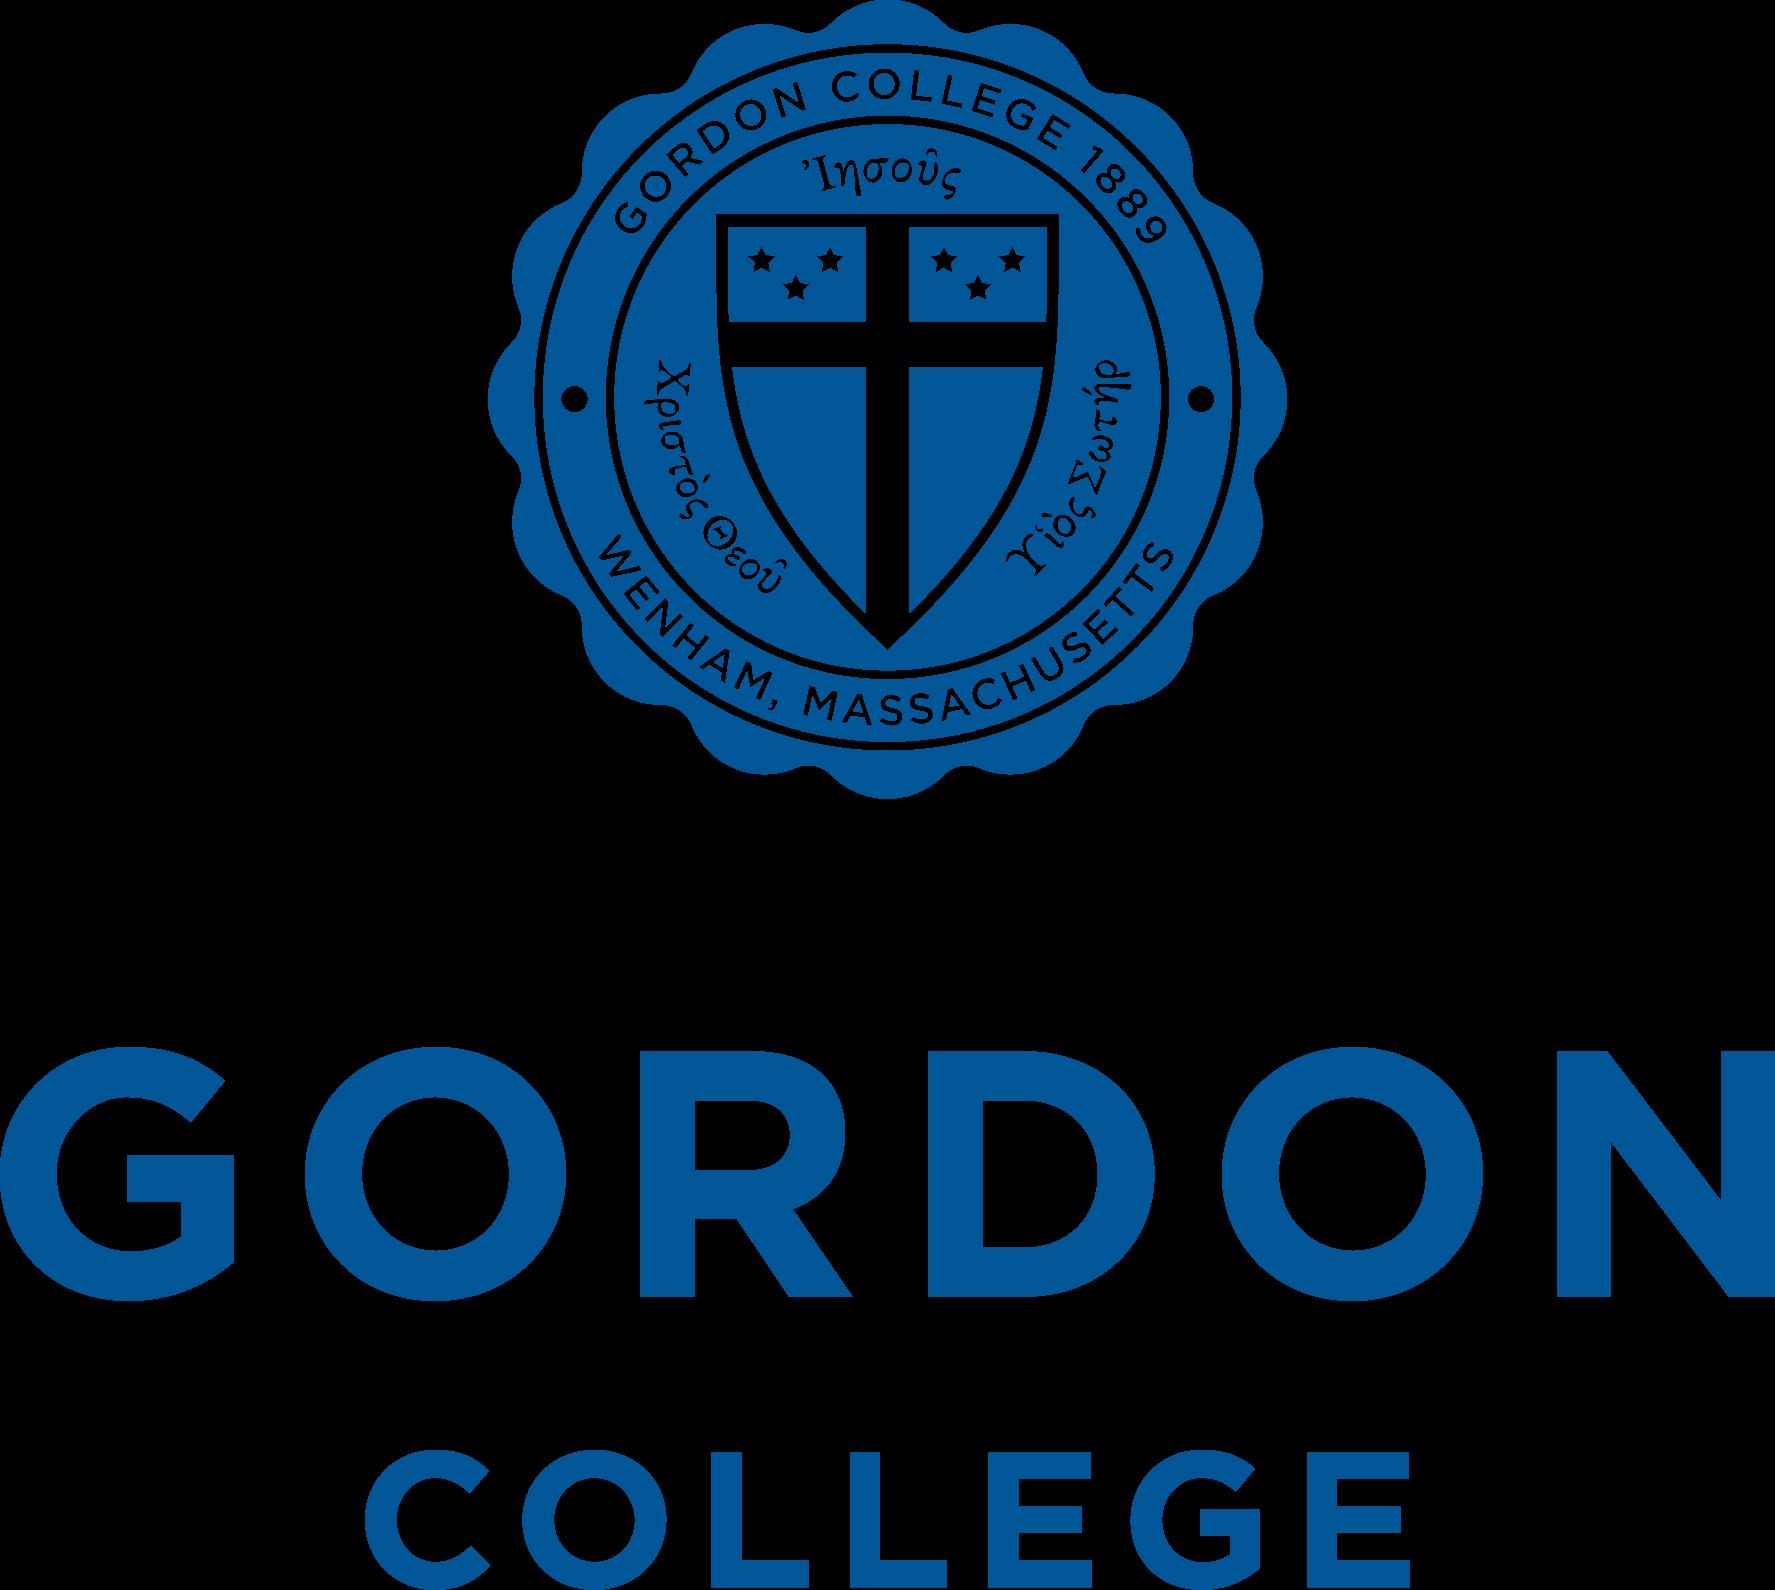 Gordon College: Fly-in to Gordon